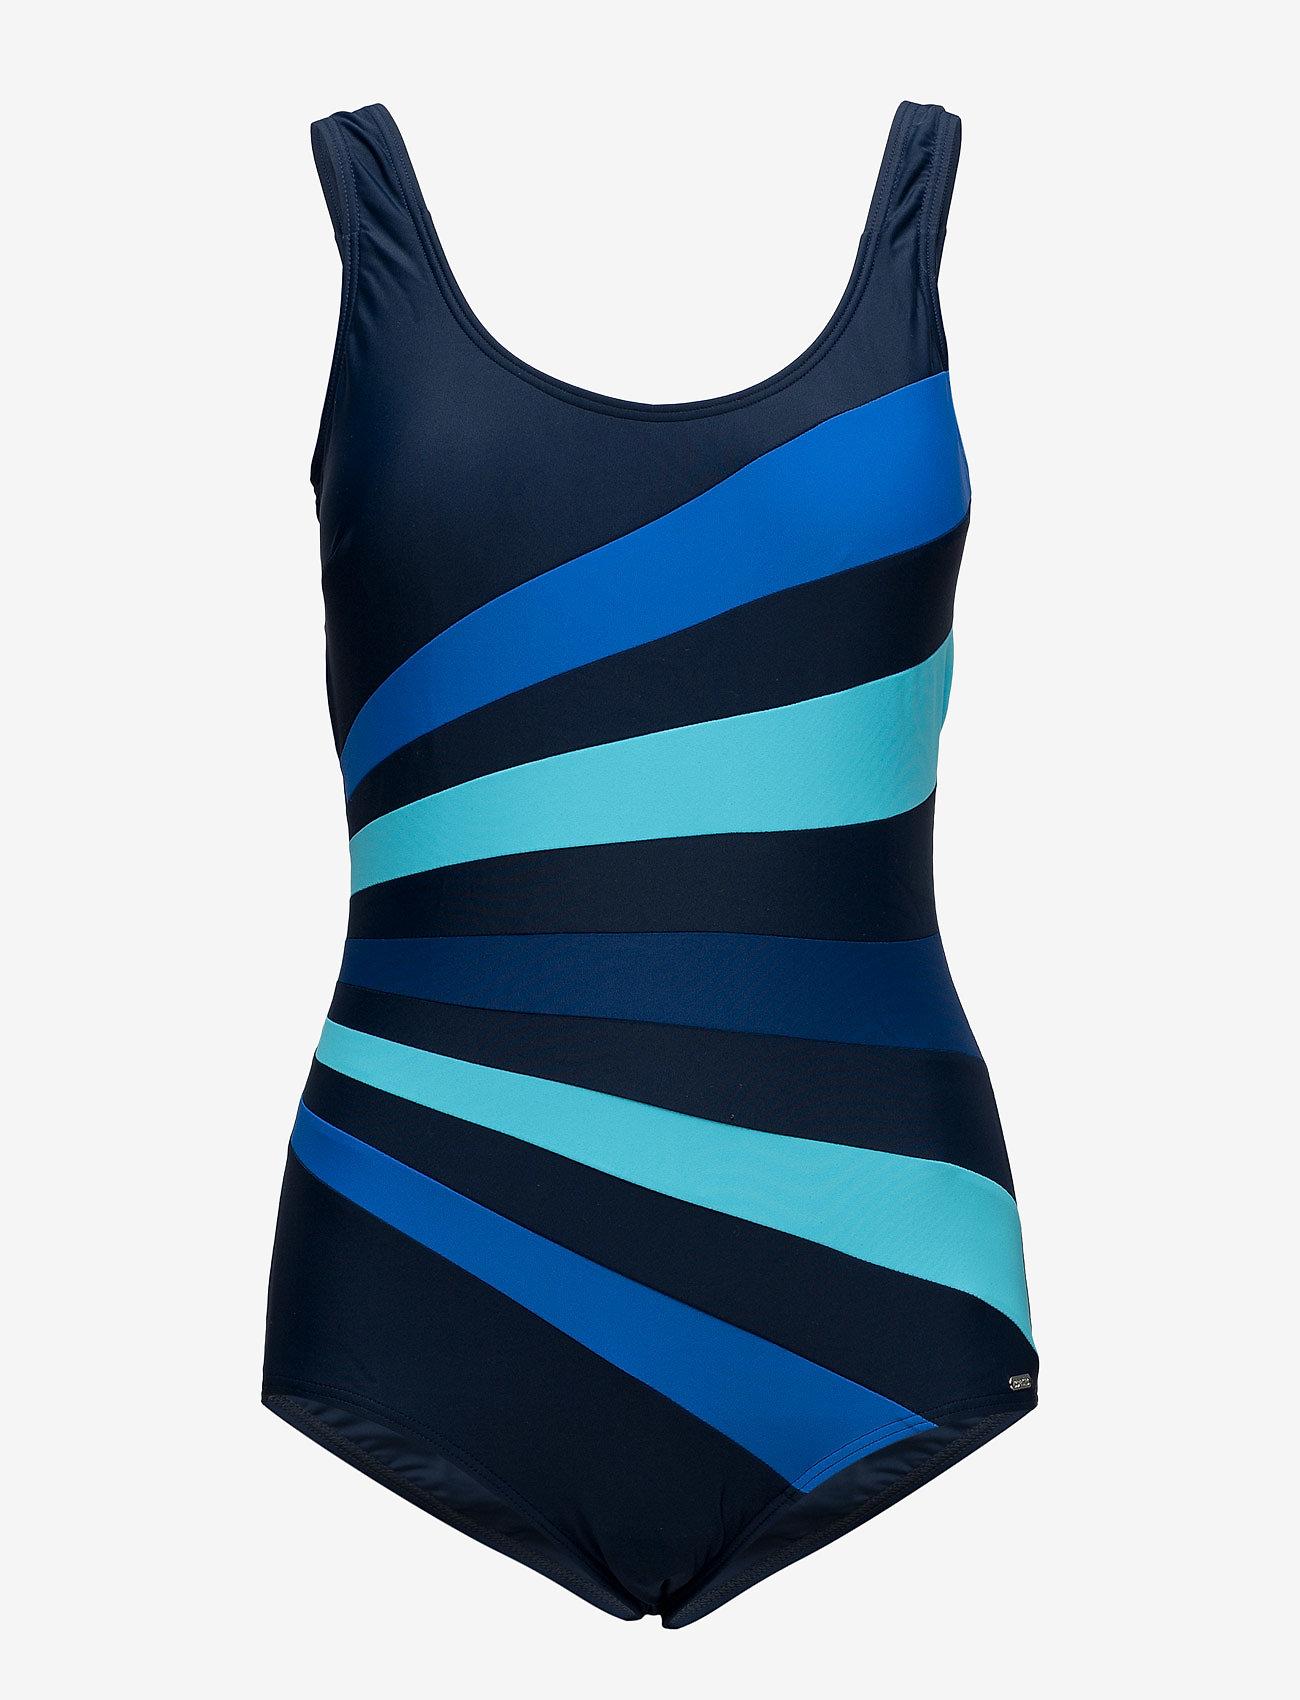 Abecita - Action Swimsuit - navy/blue - 0